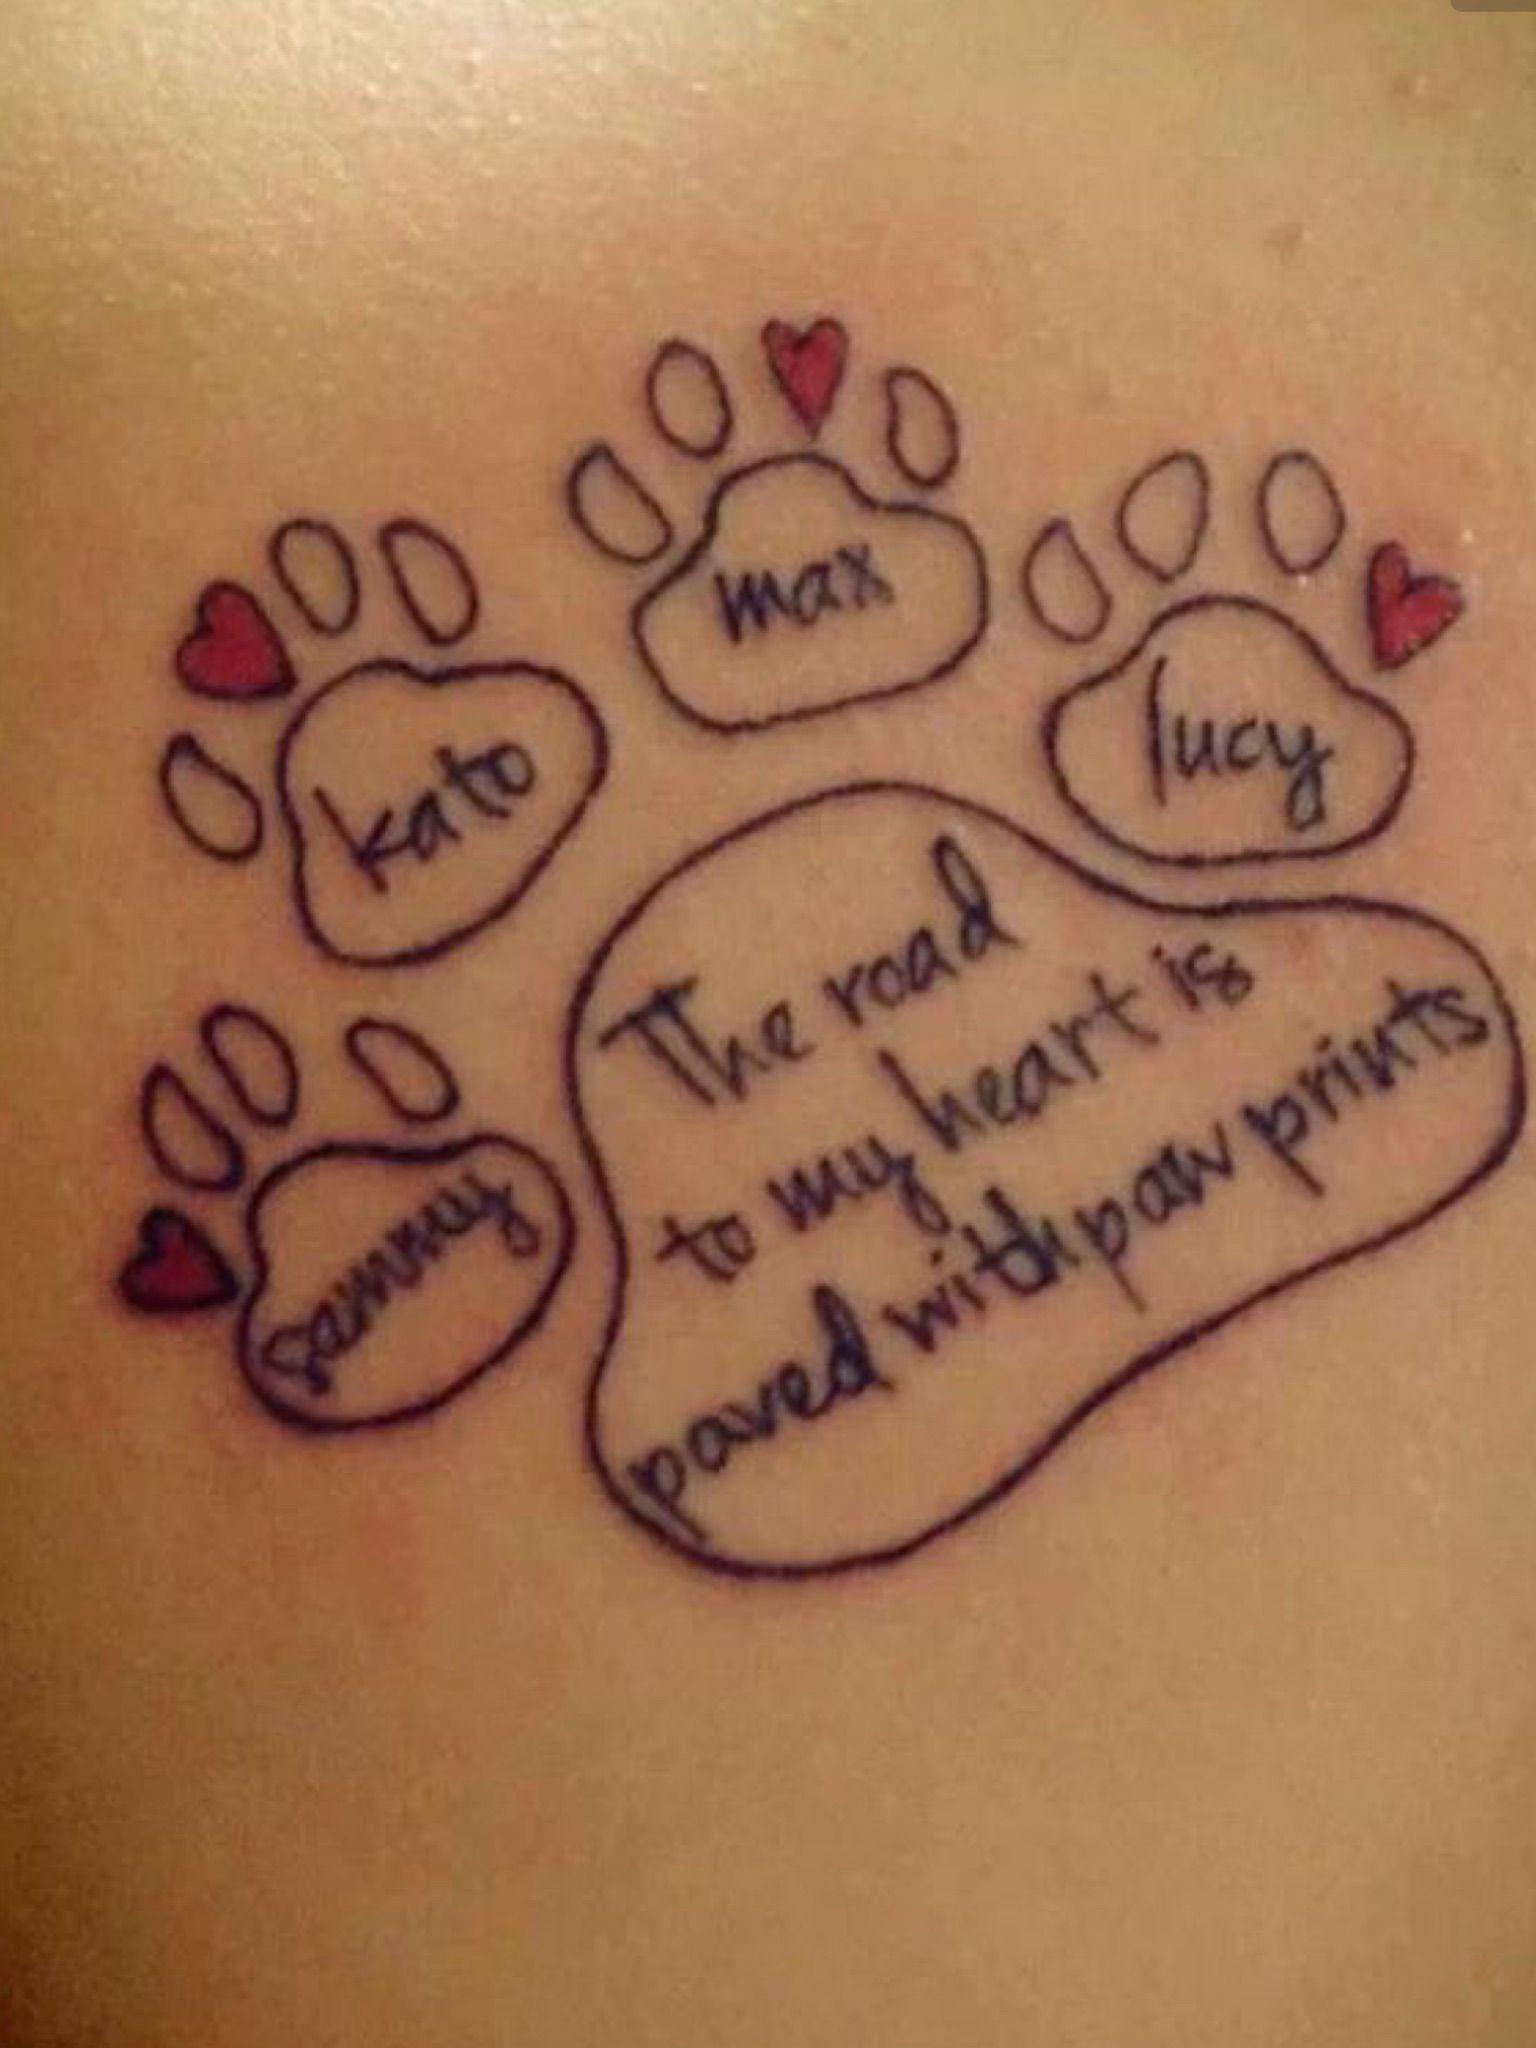 Small name tattoo ideas pin by sharon black on live long u prosper  pinterest  tattoo